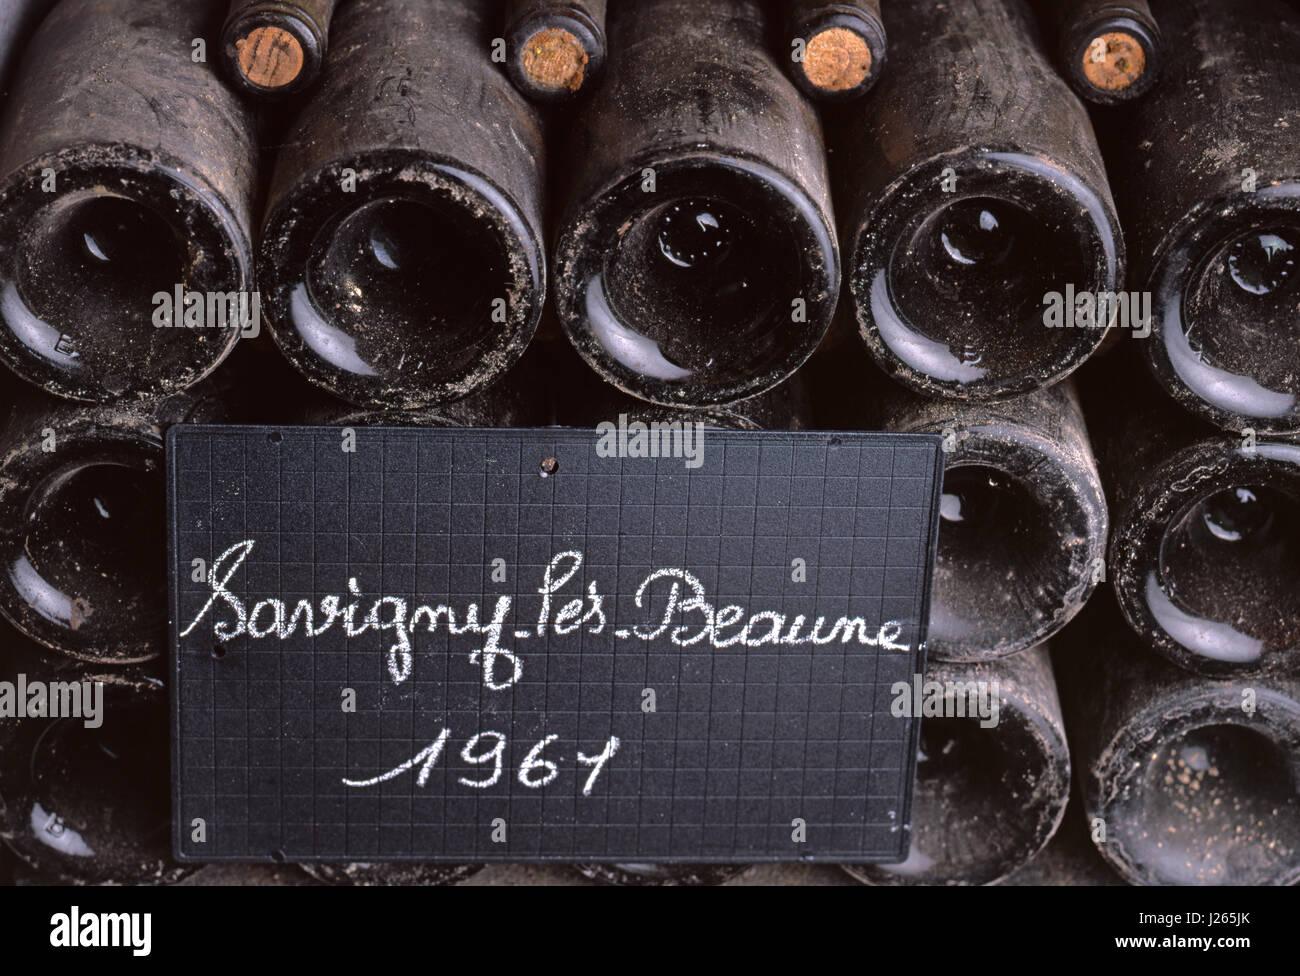 Blackboard plaque denotes bottles of 1961 Savigny-lès-Beaune in the cellars of Louis Jadot, Beaune, Côte - Stock Image